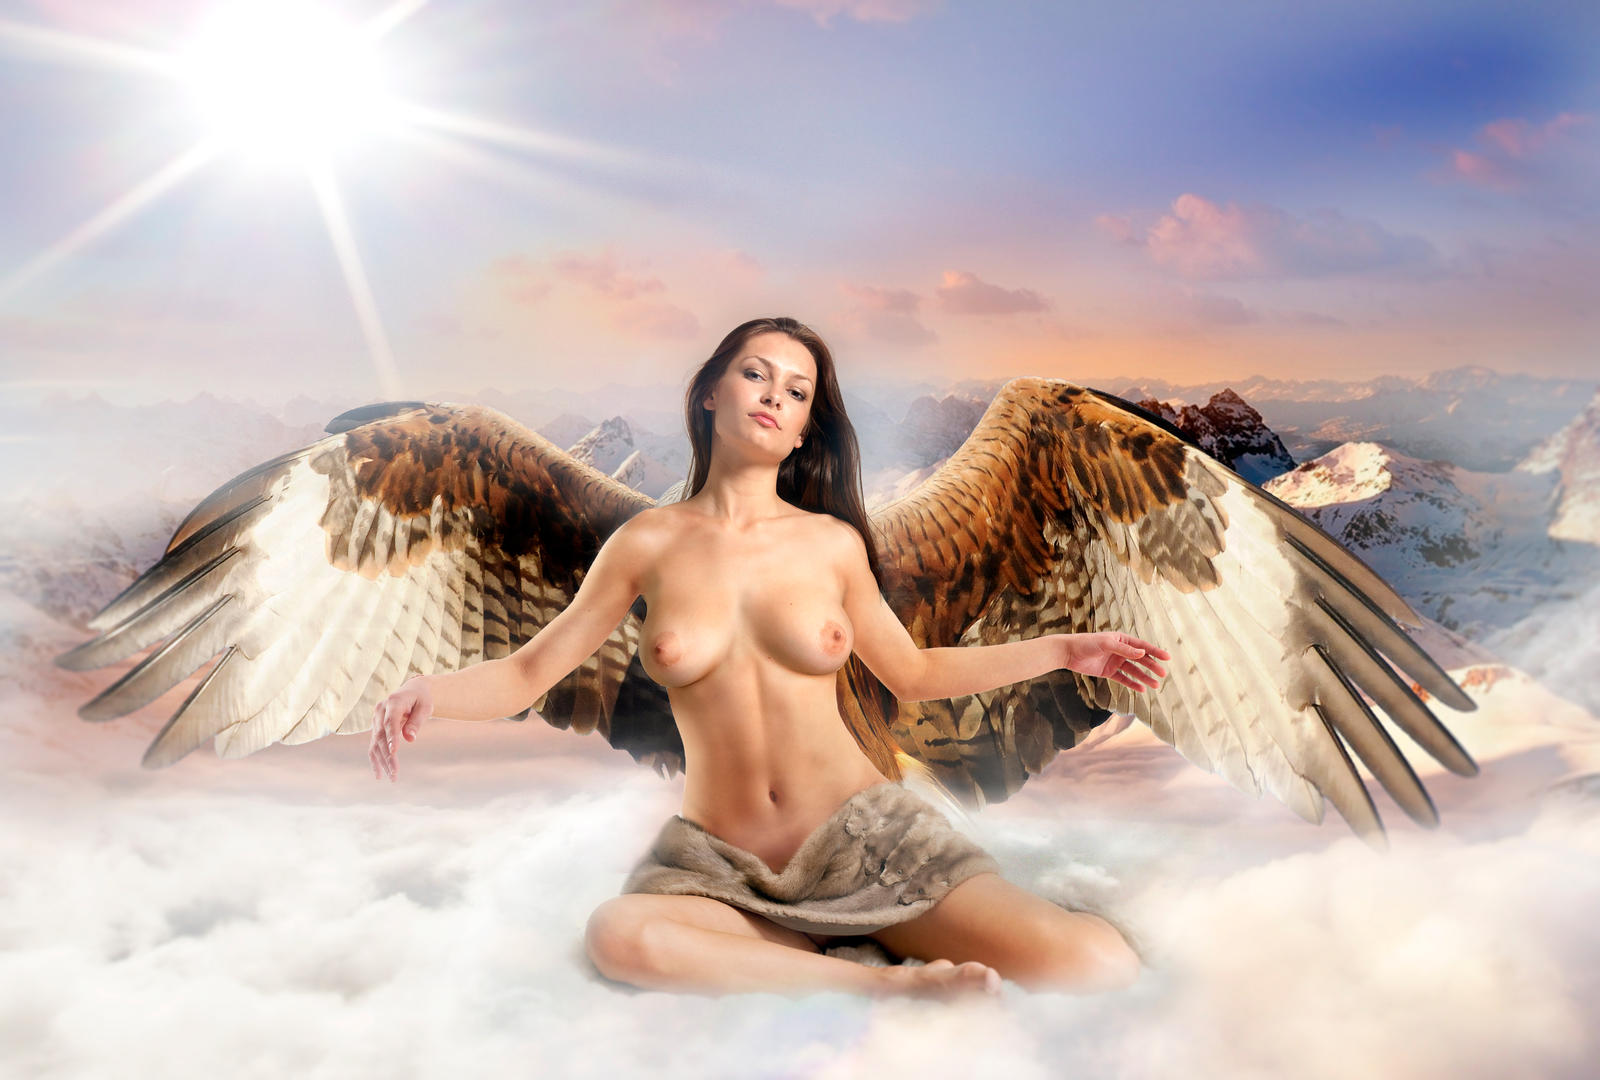 Hawkgirl , goddess of Valhalla by FueledbypartII